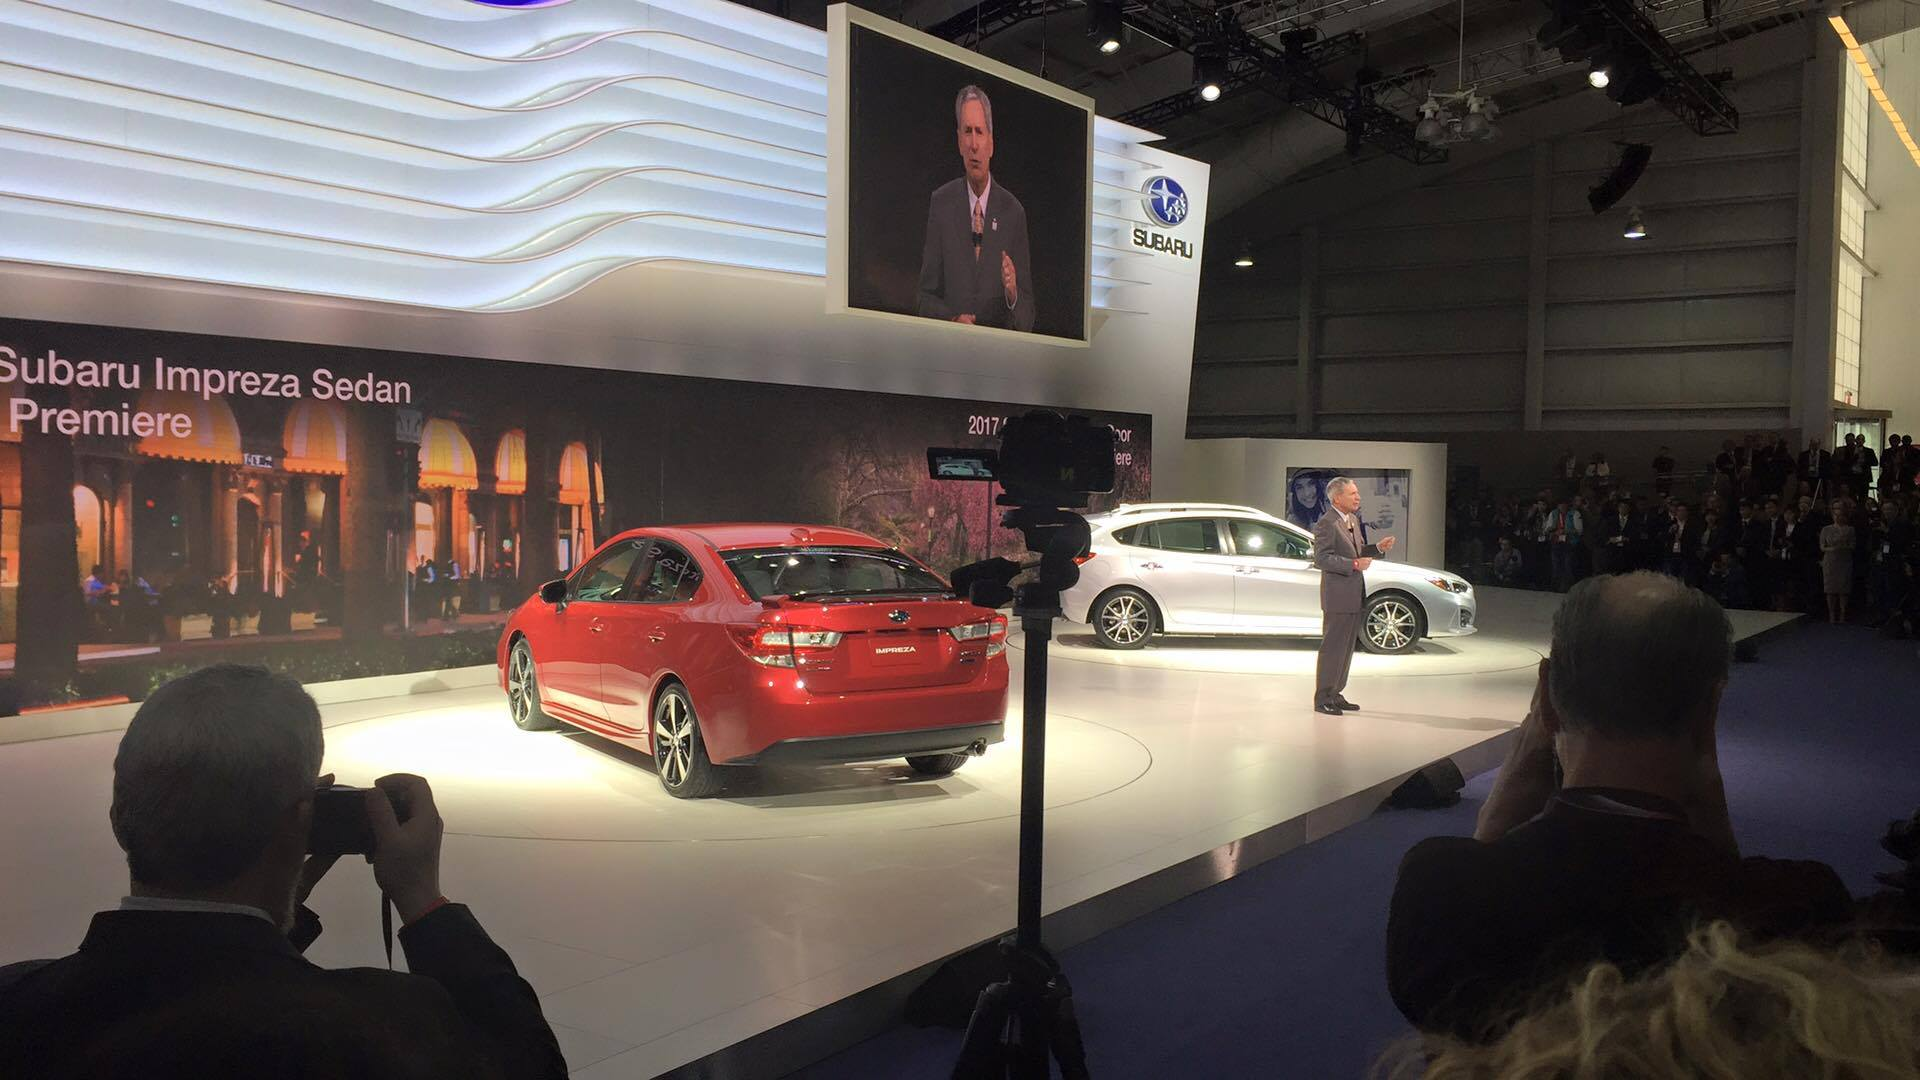 Could The 2017 Subaru Impreza Sedan Be A Game Changer For The Sedan